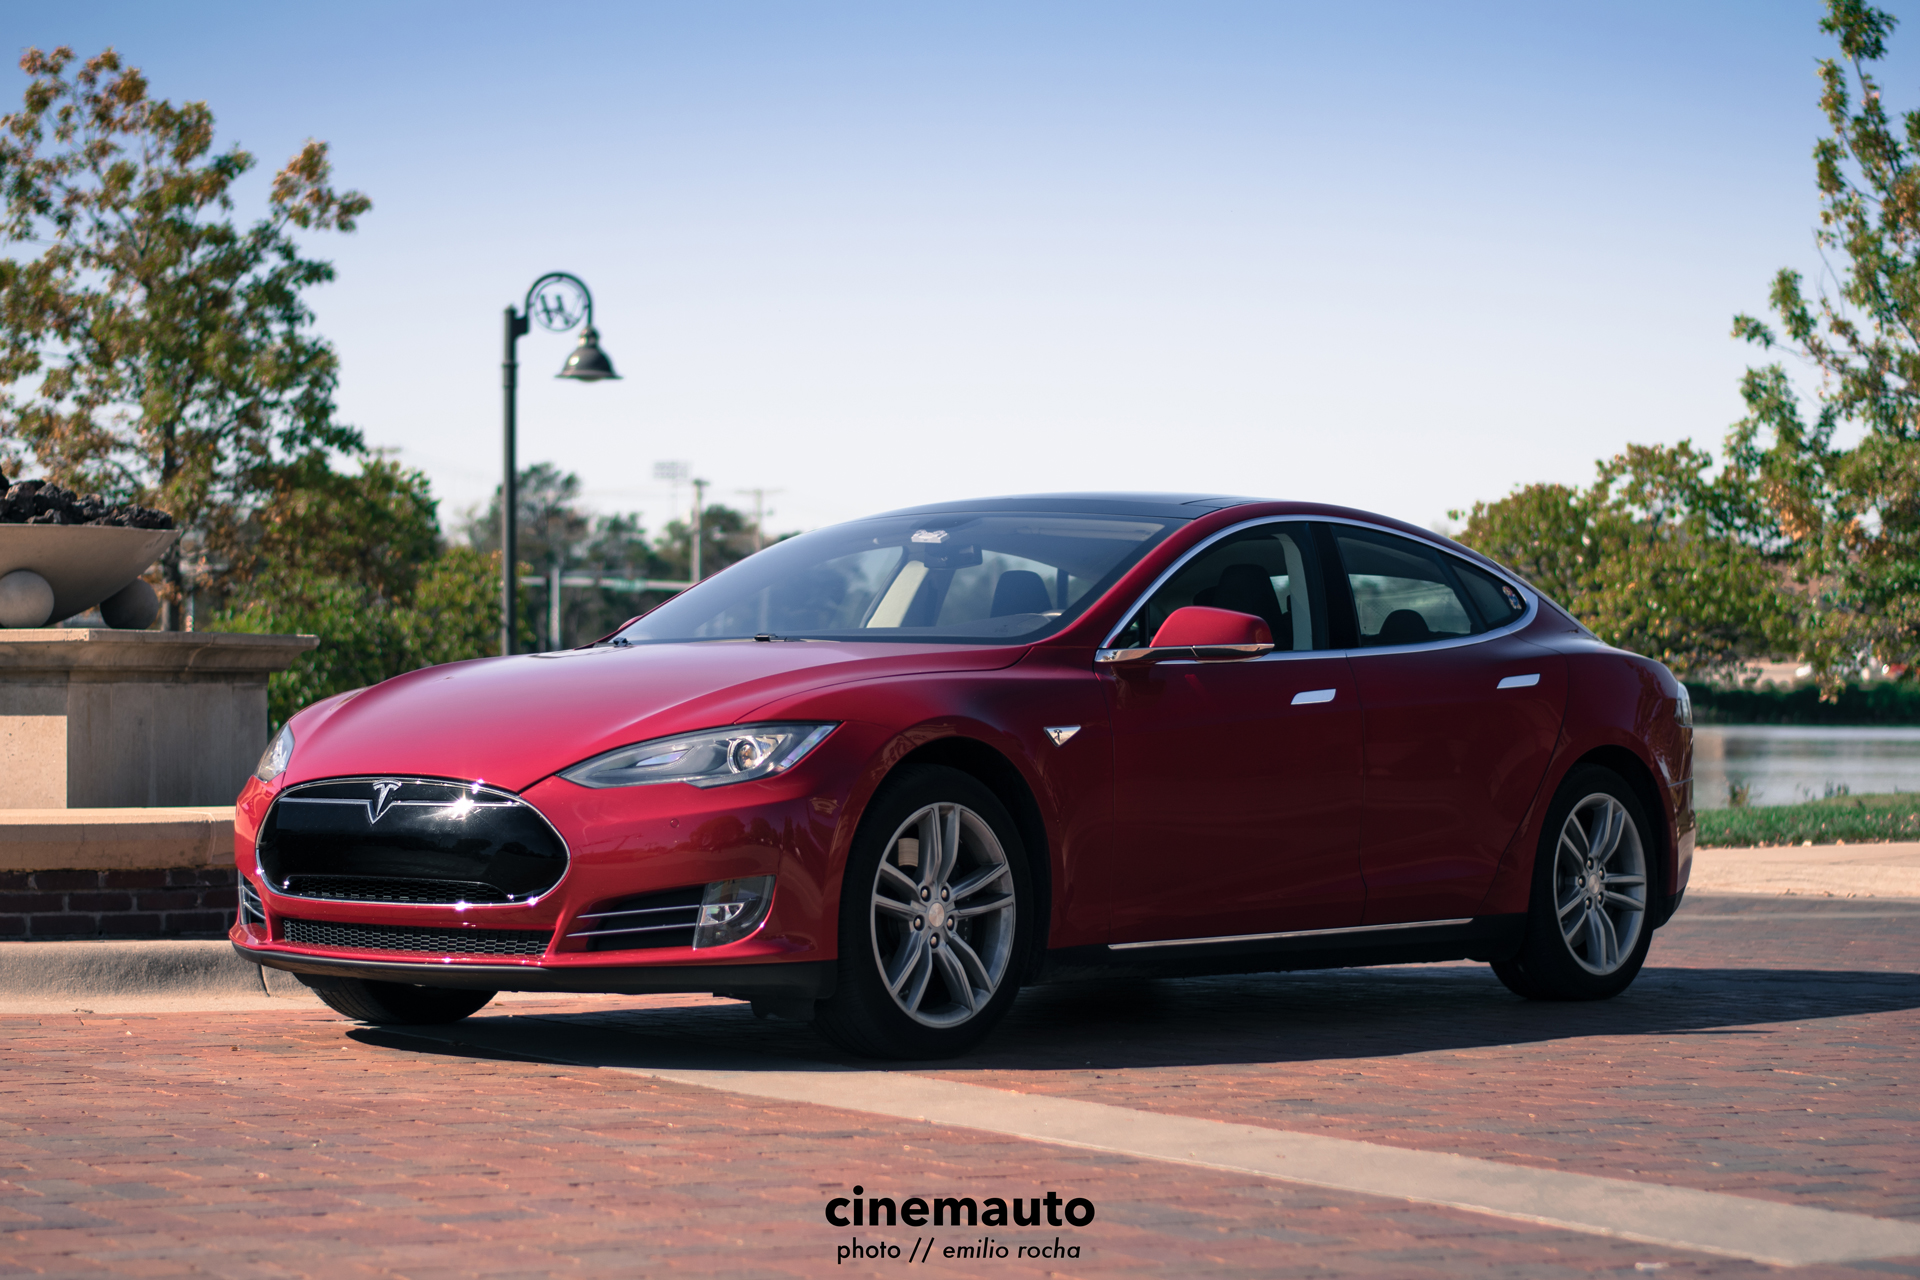 TeslaCinemauto-2.jpg